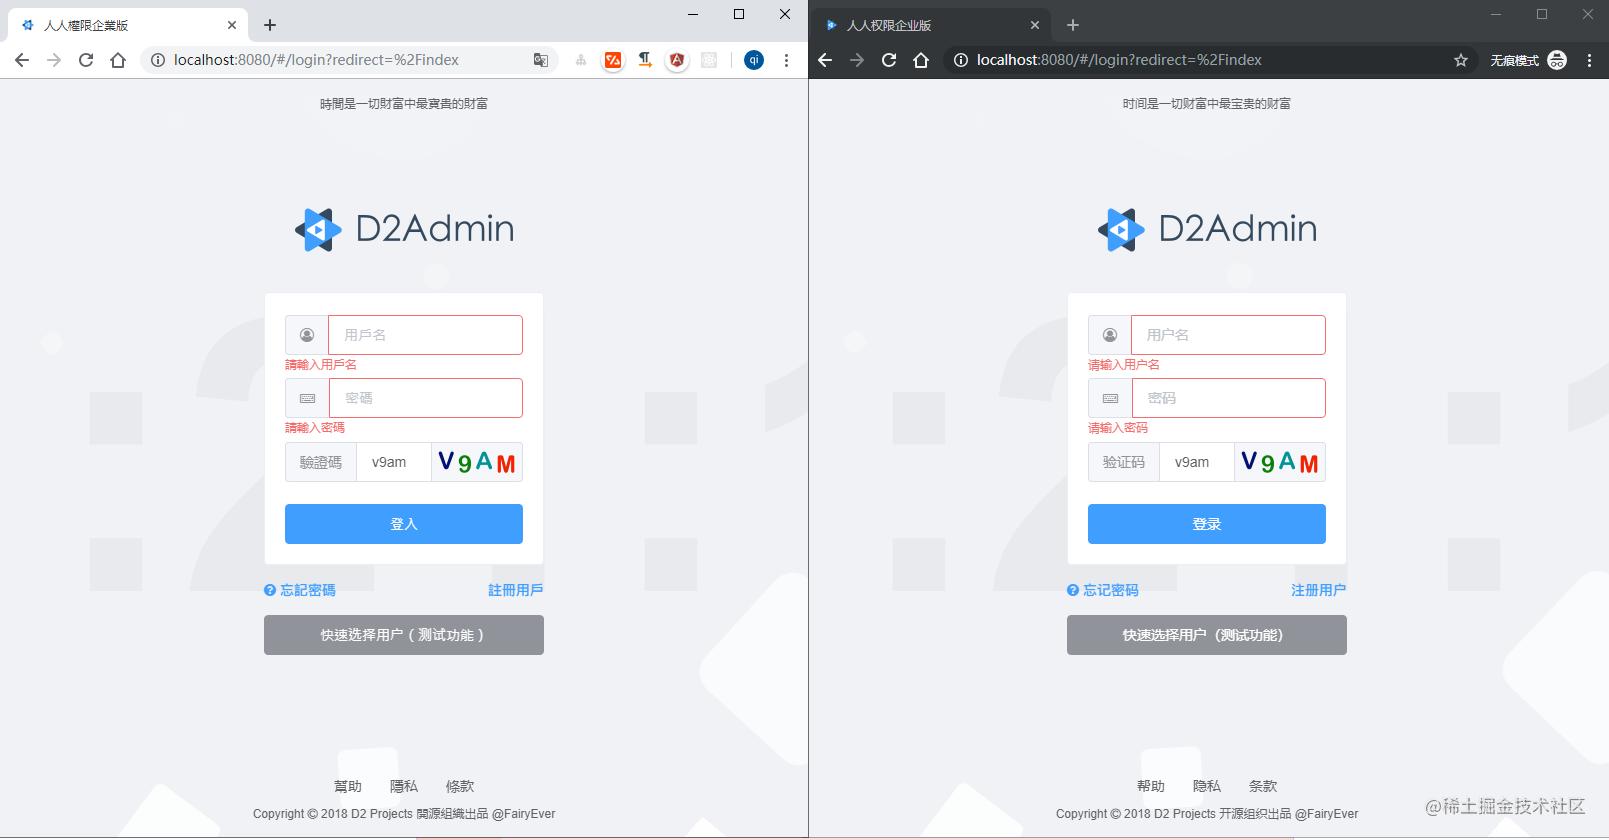 d2-admin-renren-security-enterprise-i18n